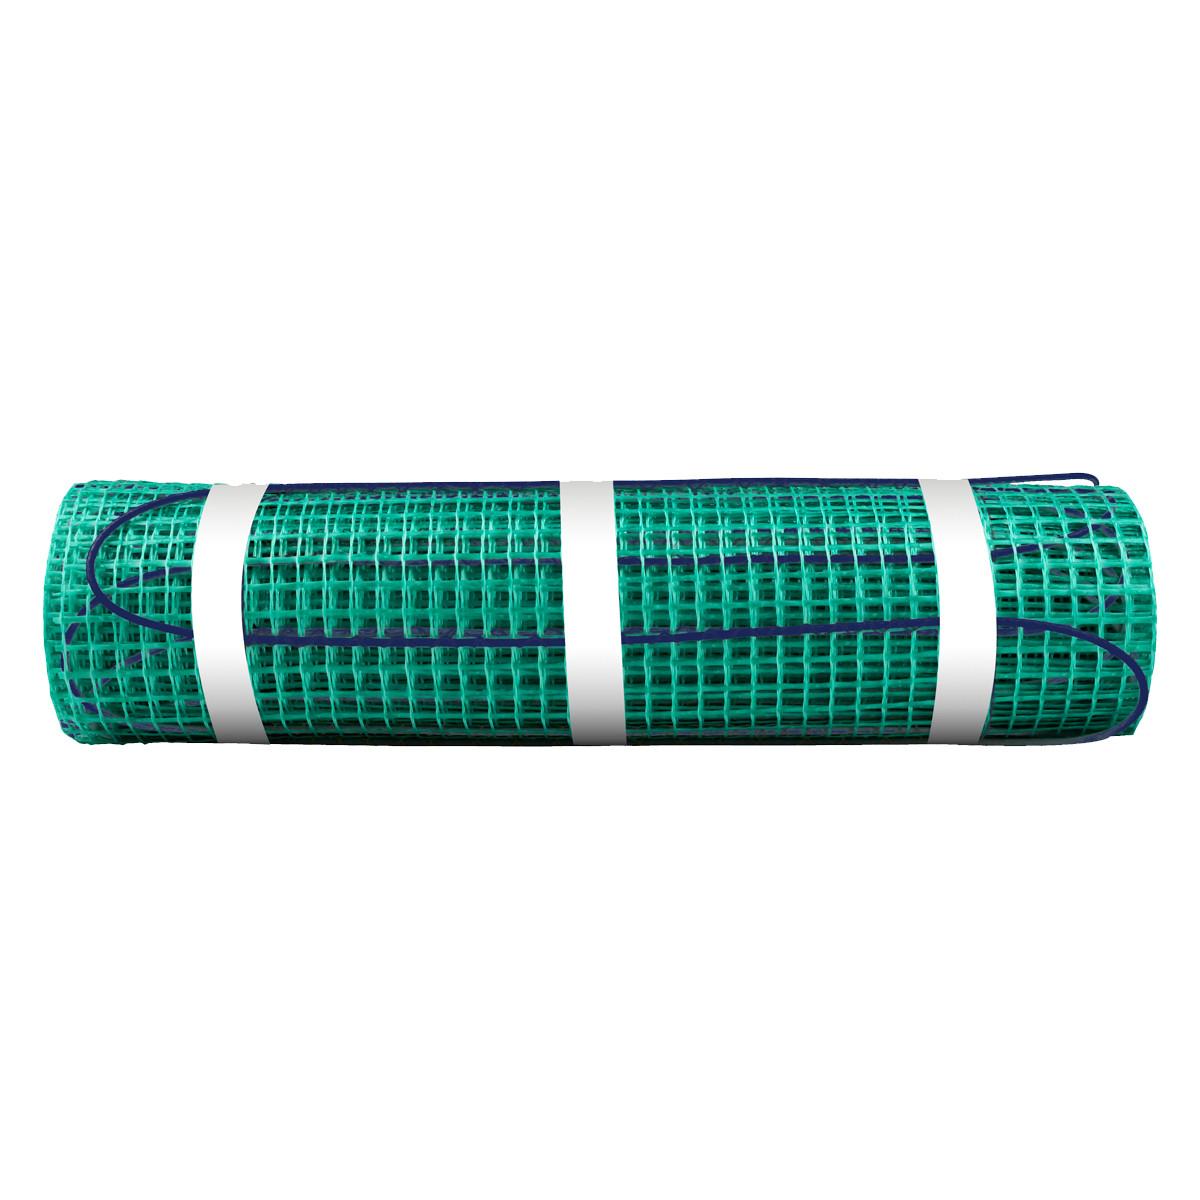 WarmlyYours TRT120-1.5x15 TempZone 120V 2.9A 1.5 Foot x 15 Foot Flex Roll